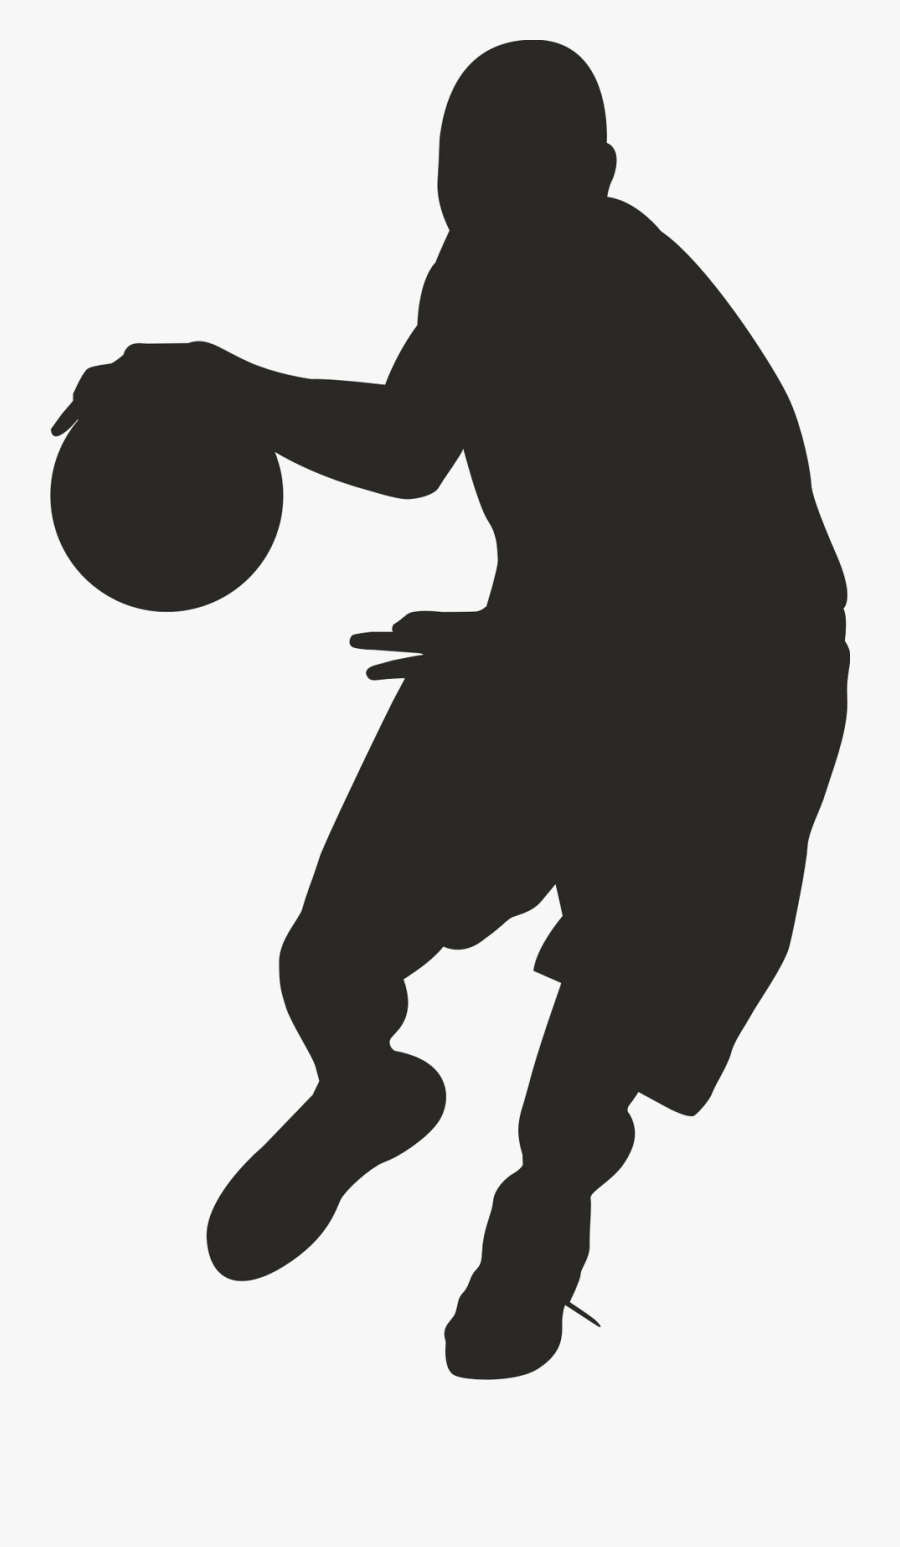 Basketball Clip Art Clipart Silhouette Transparent - Basketball Player Clipart Black, Transparent Clipart